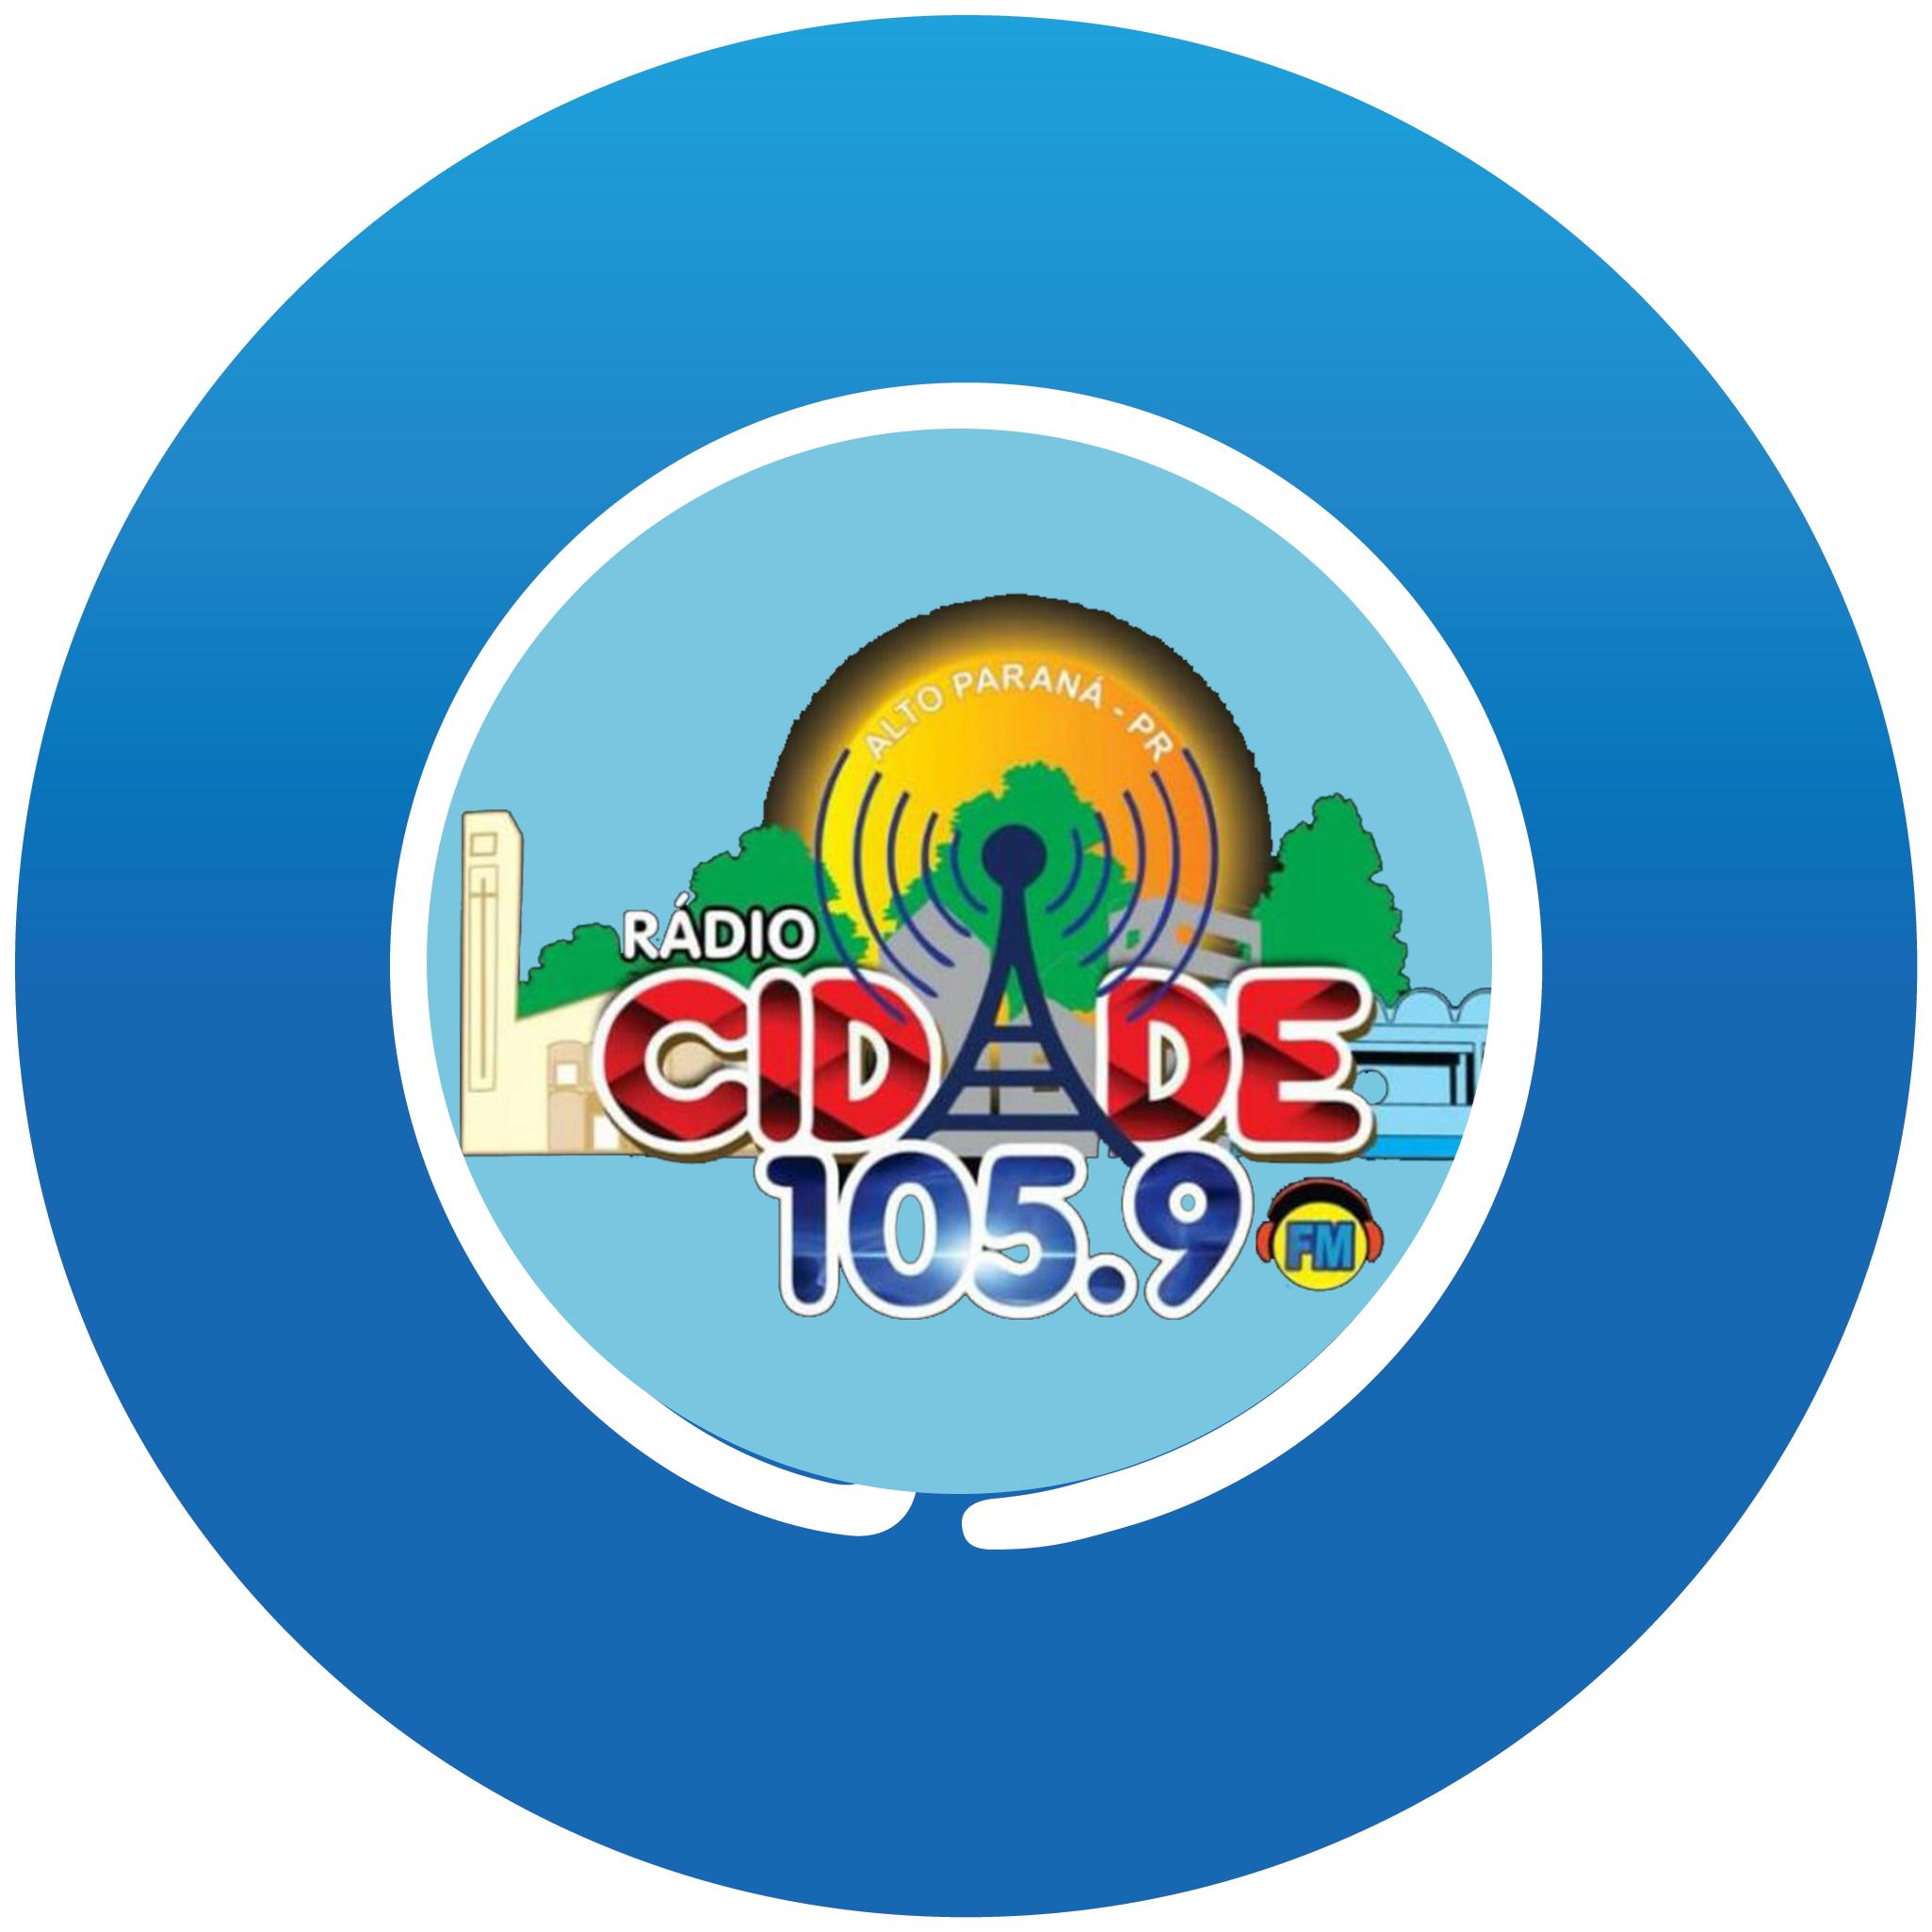 RADIO CIDADE FM 105,9 FM